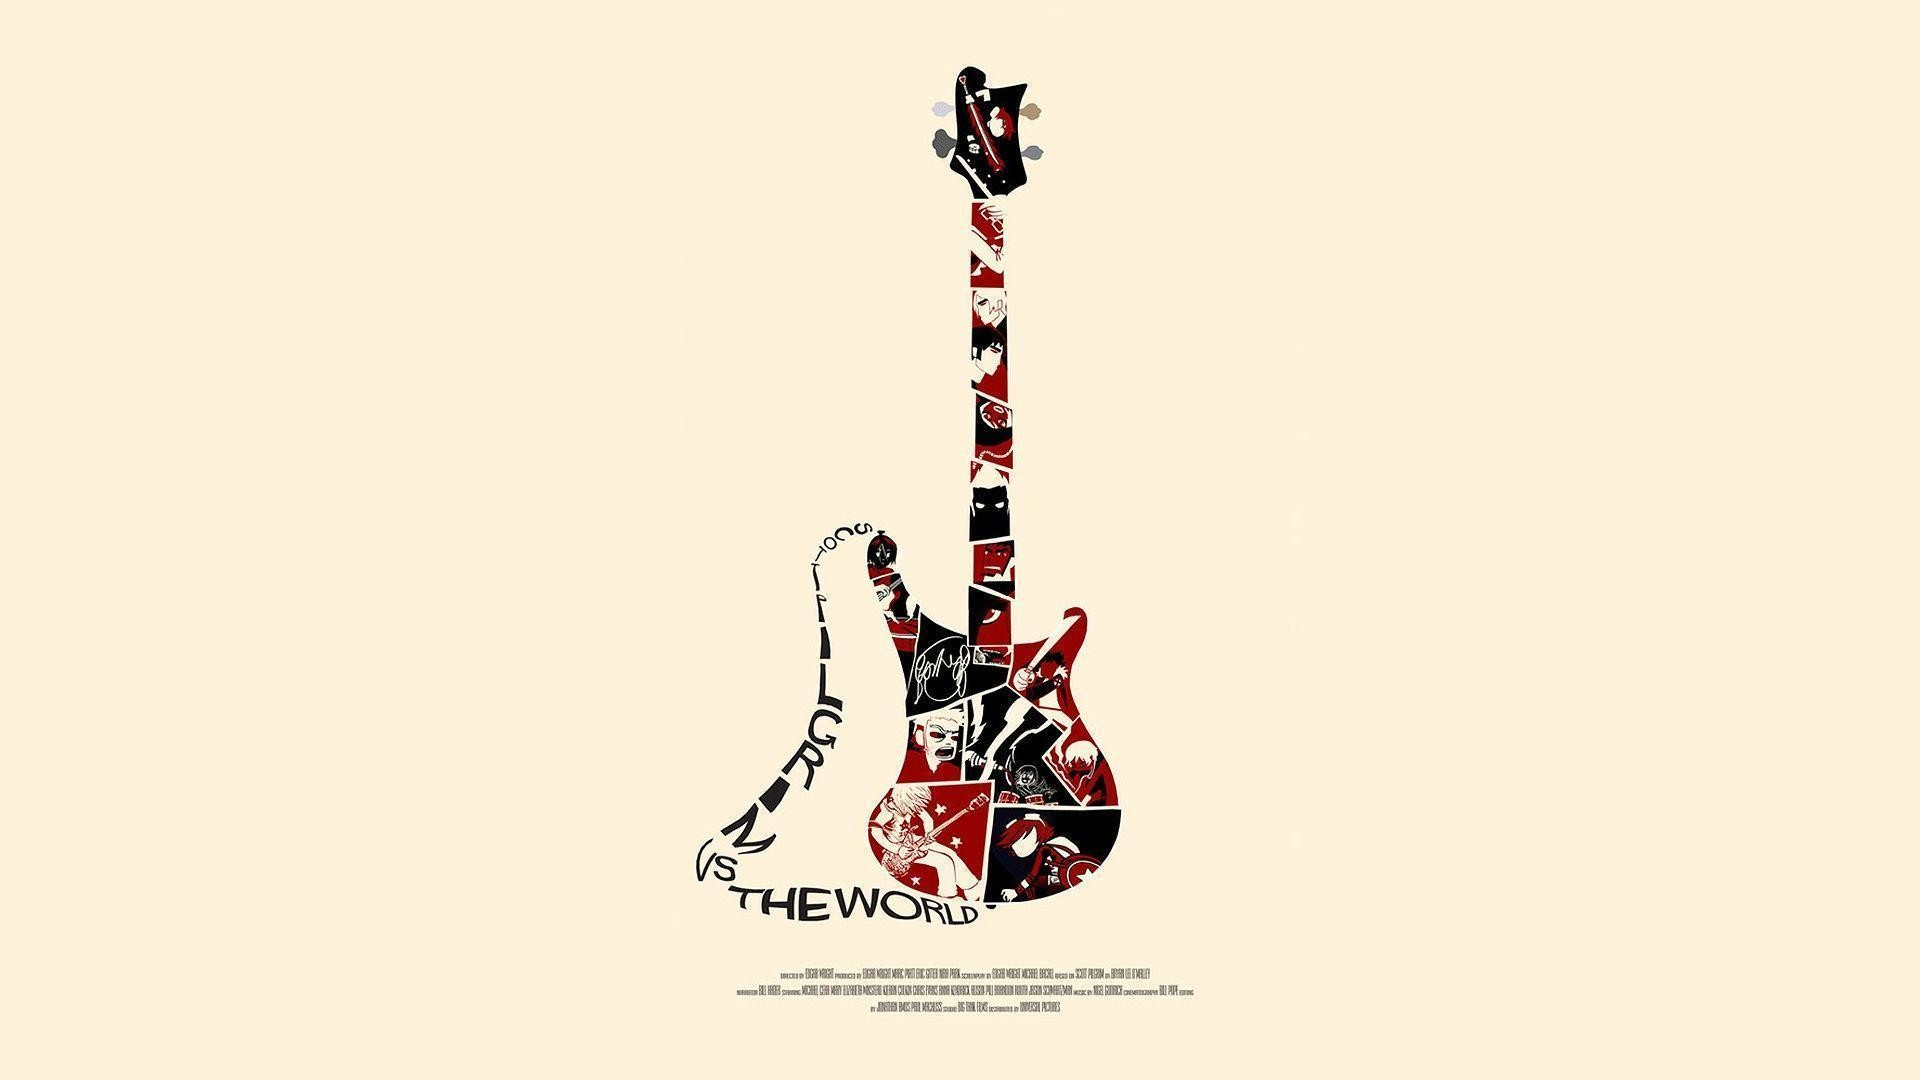 scott pilgrim guitar guitars movie wallpaper 117377